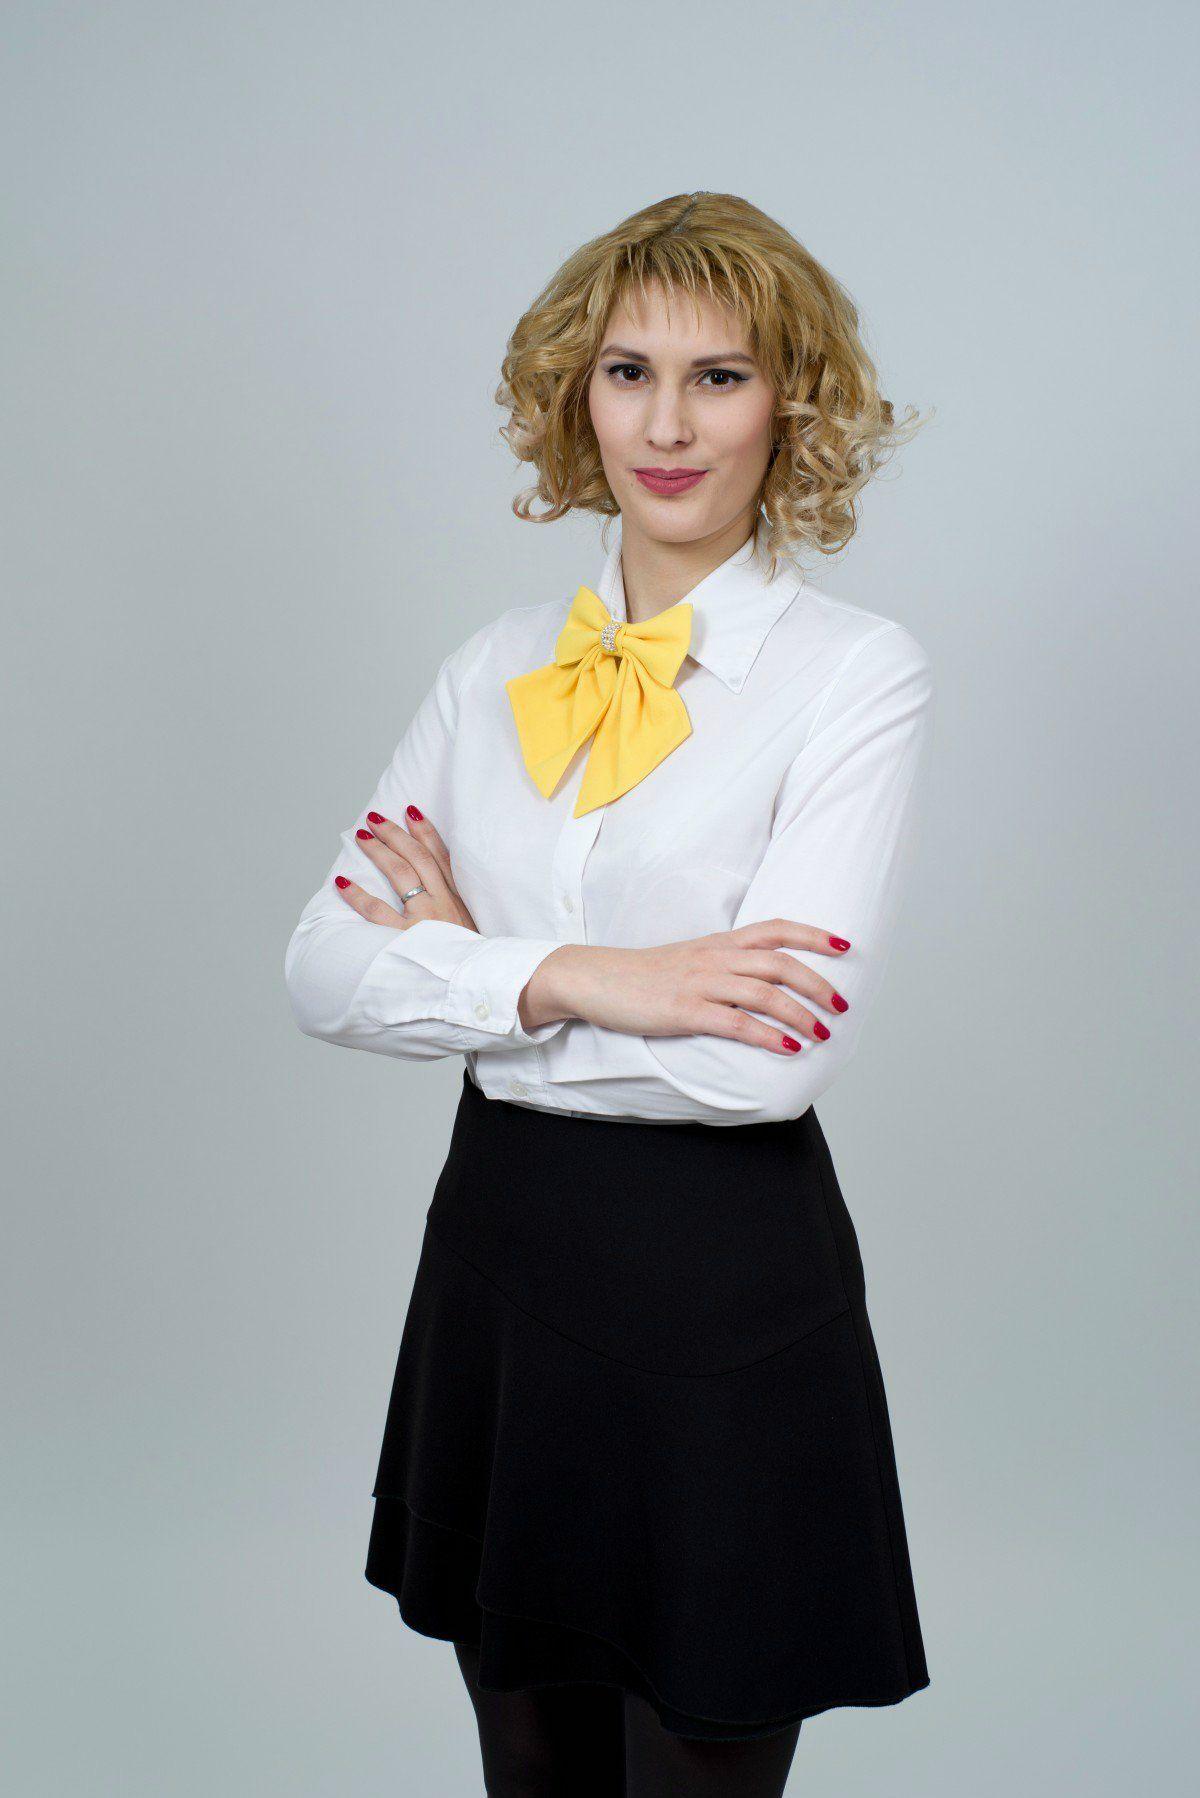 The Administrative Concierge